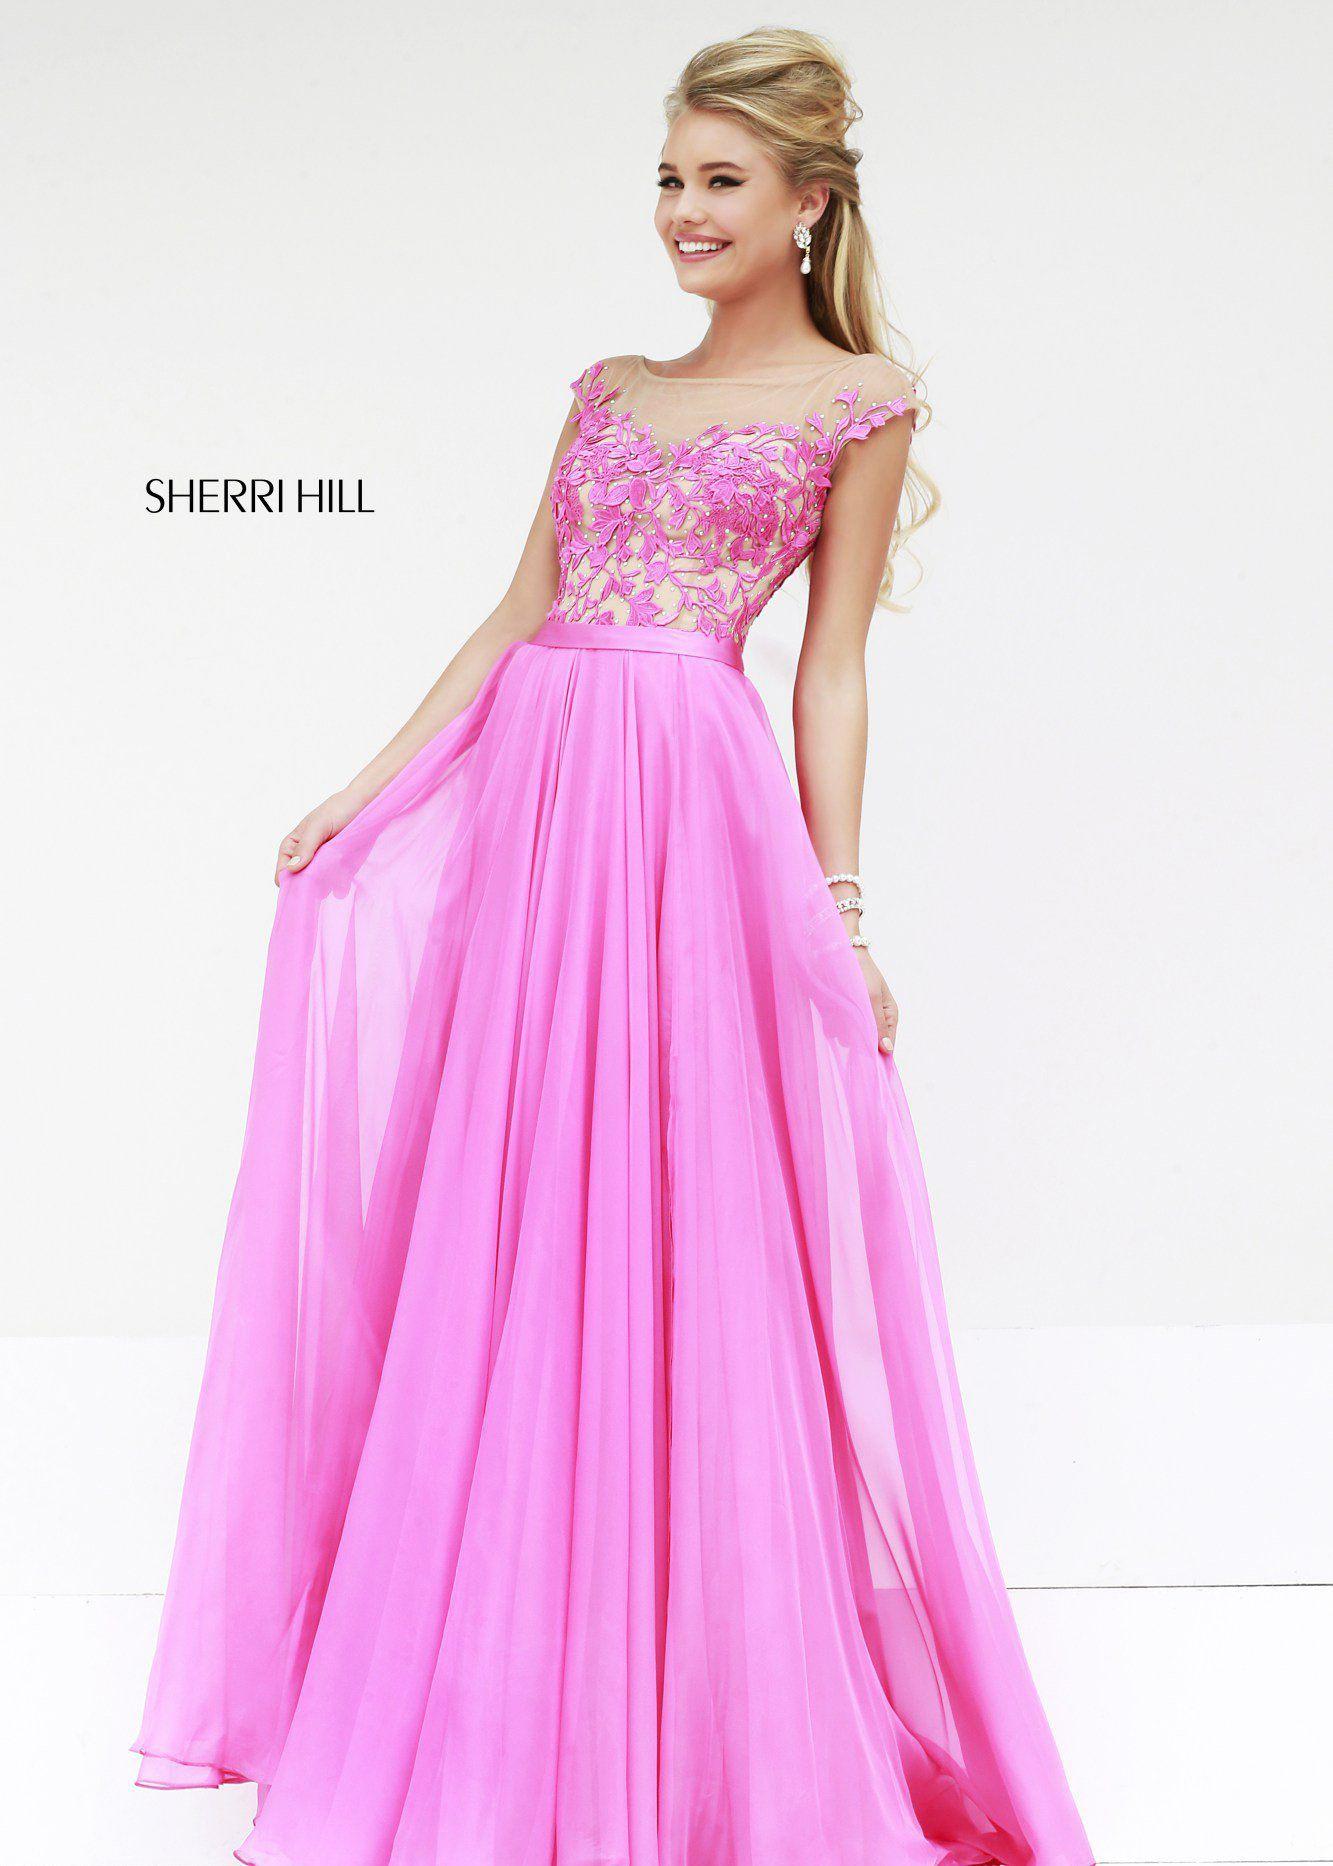 Shop New 2014 Sherri Hill Prom Dresses, find Sherri Hill 11151 pink ...